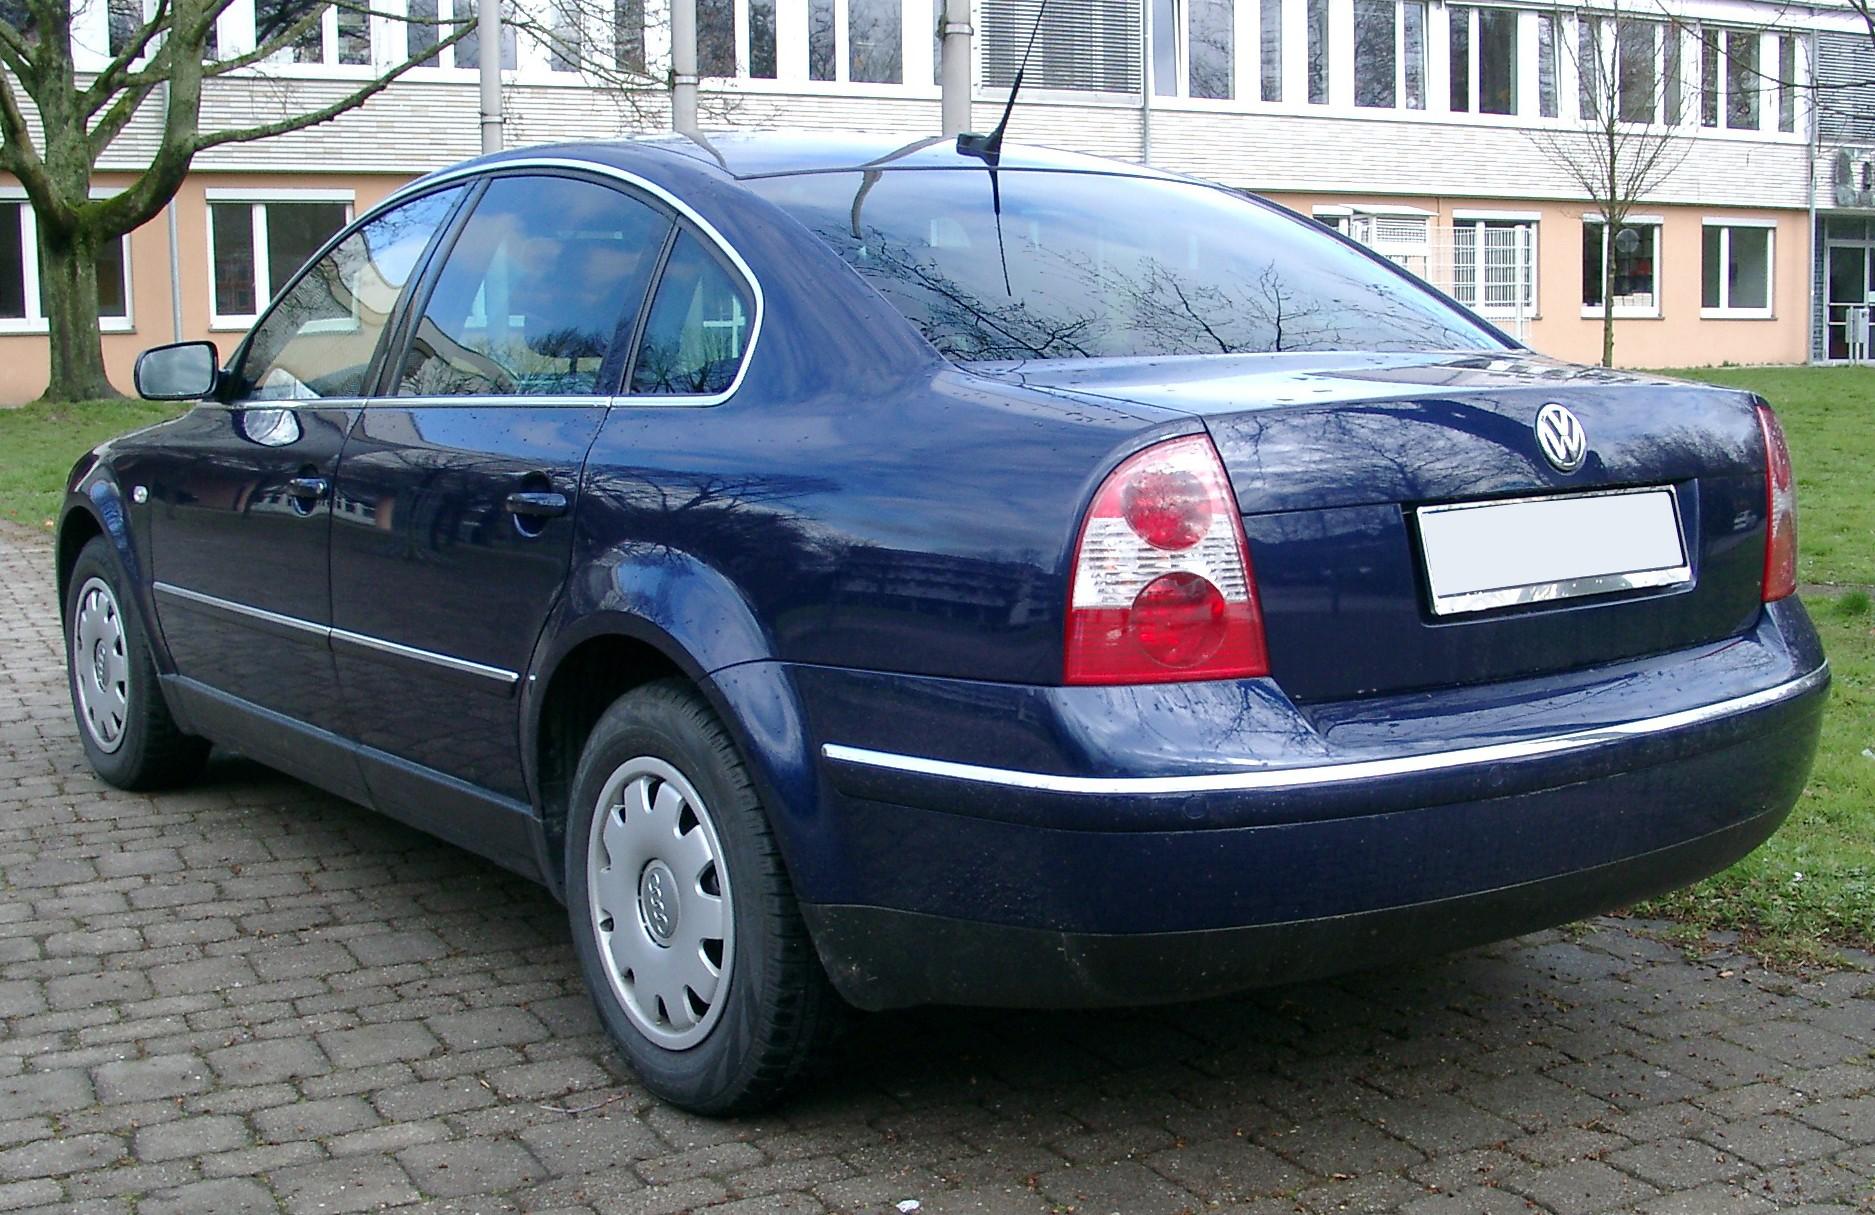 Bremsbeläge front vorne für Audi A4 Avant VW Passat 3B Kombi 1,6 1,8 1,9 TDI